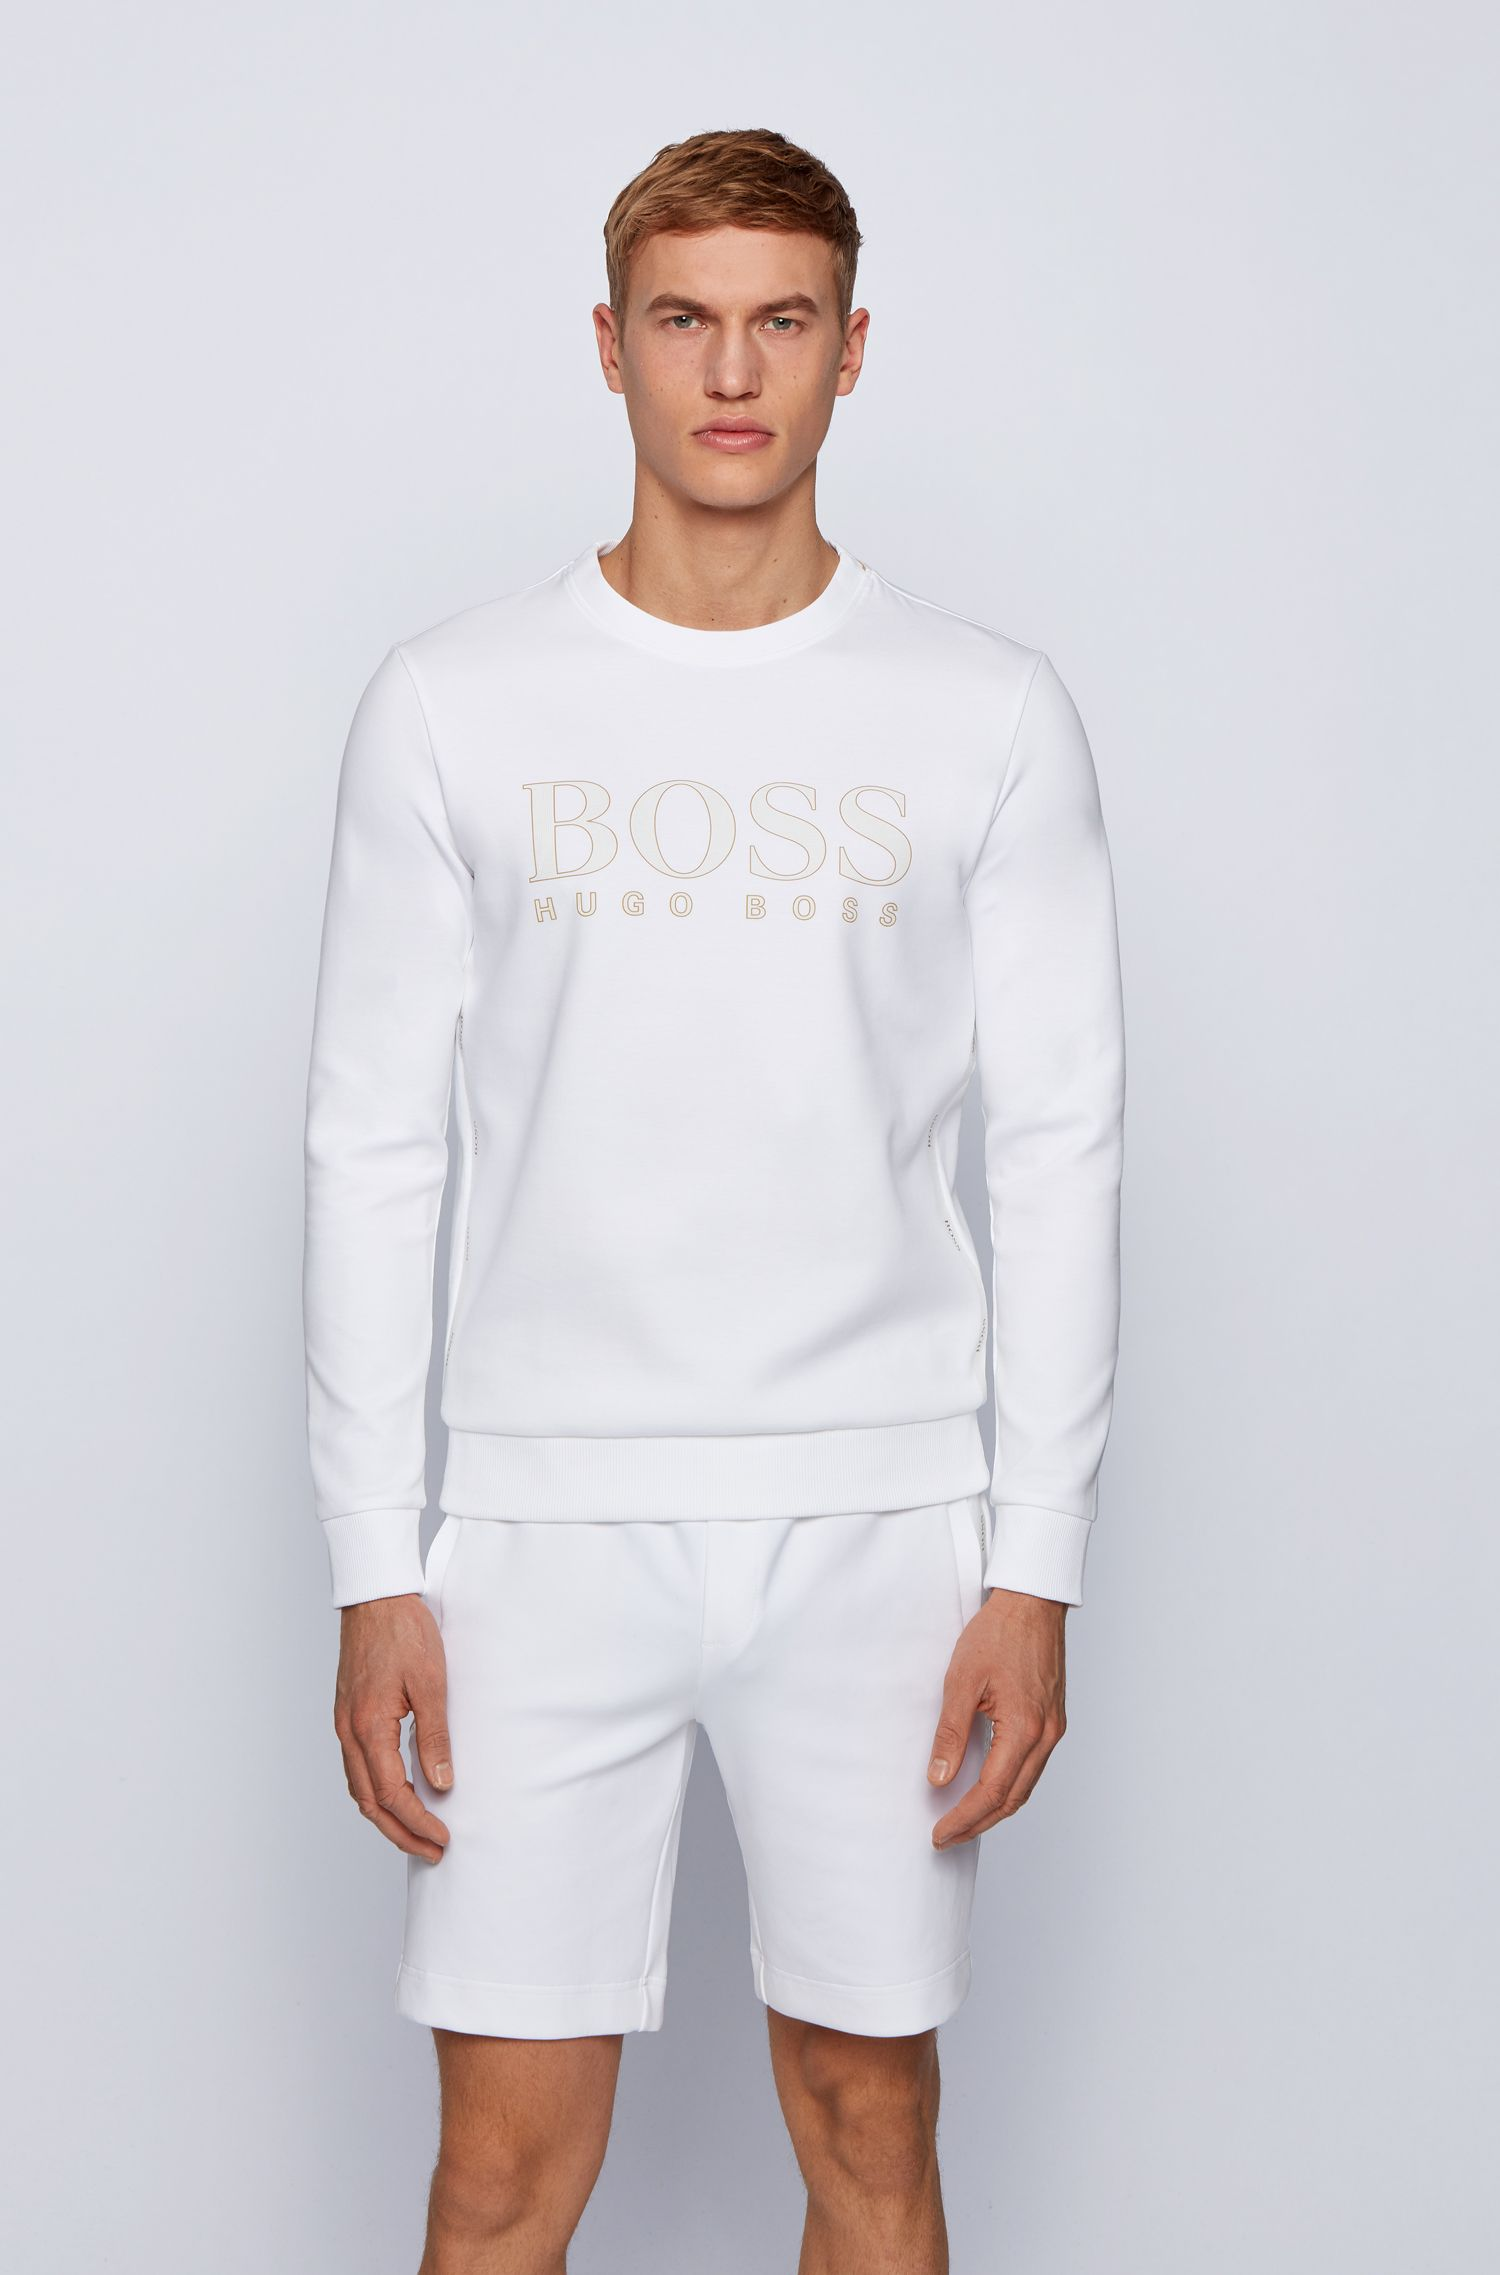 Slim fit sweatshirt in woven cotton blend with printed logo BOSS | Sweatshirt | 50448186100